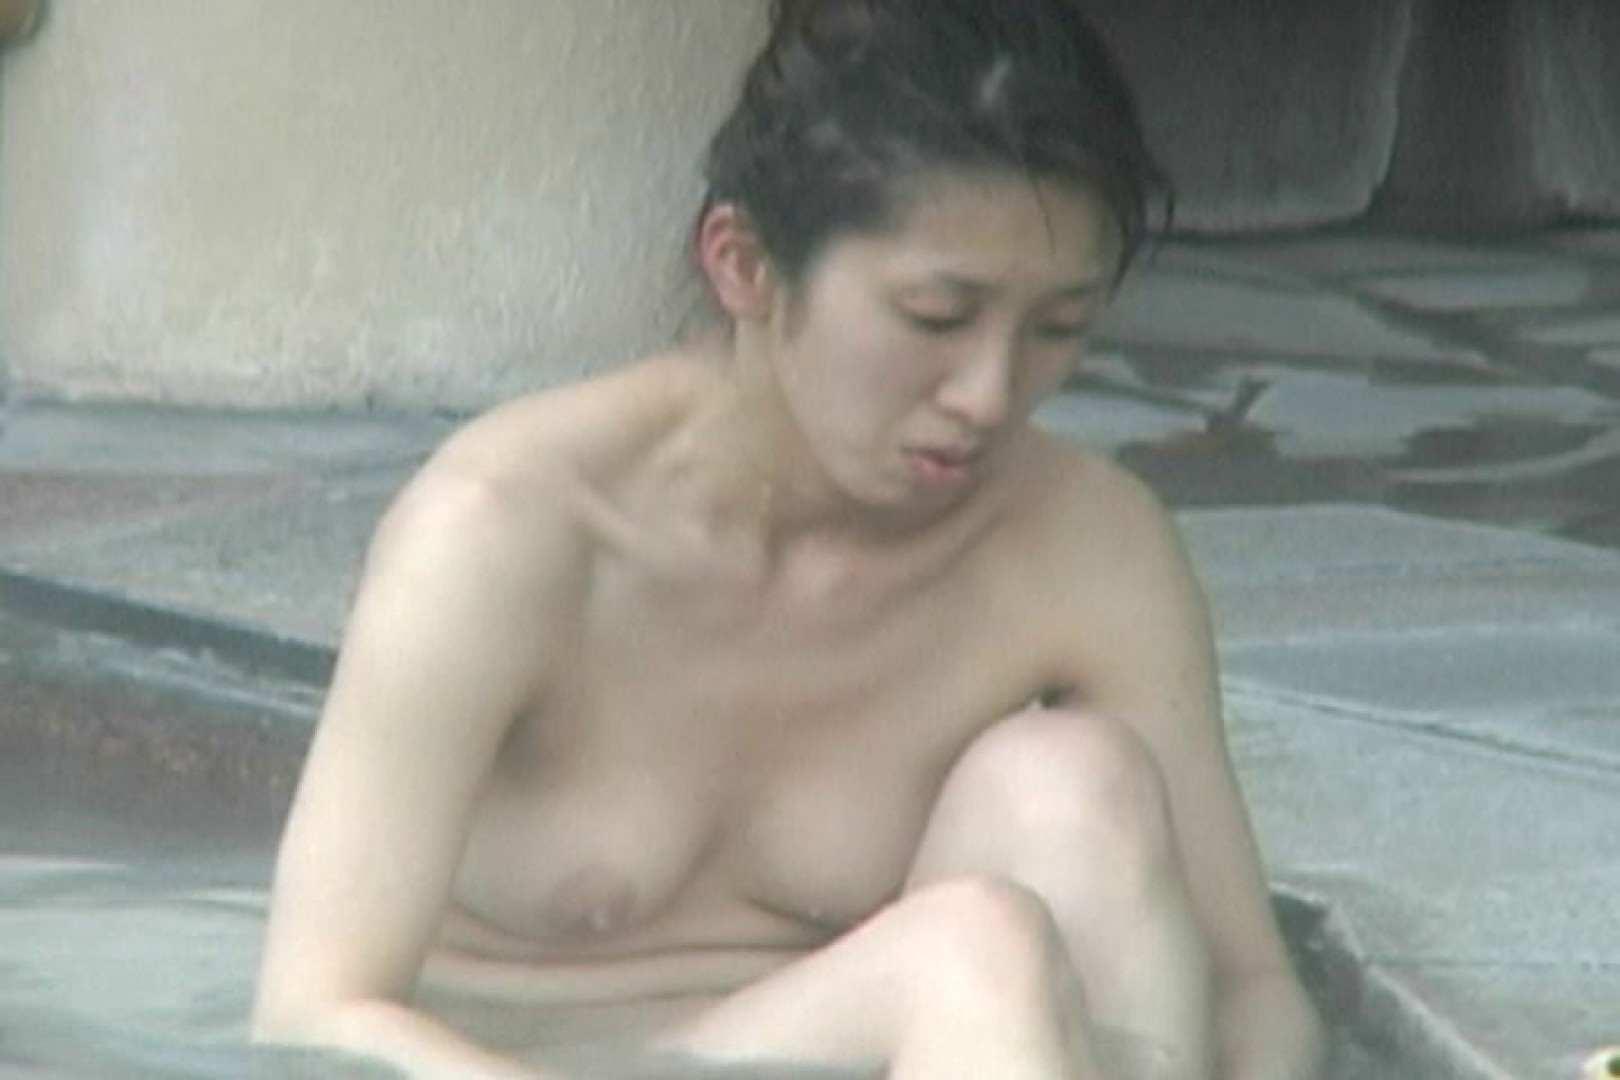 Aquaな露天風呂Vol.588 HなOL | 盗撮  66pic 10